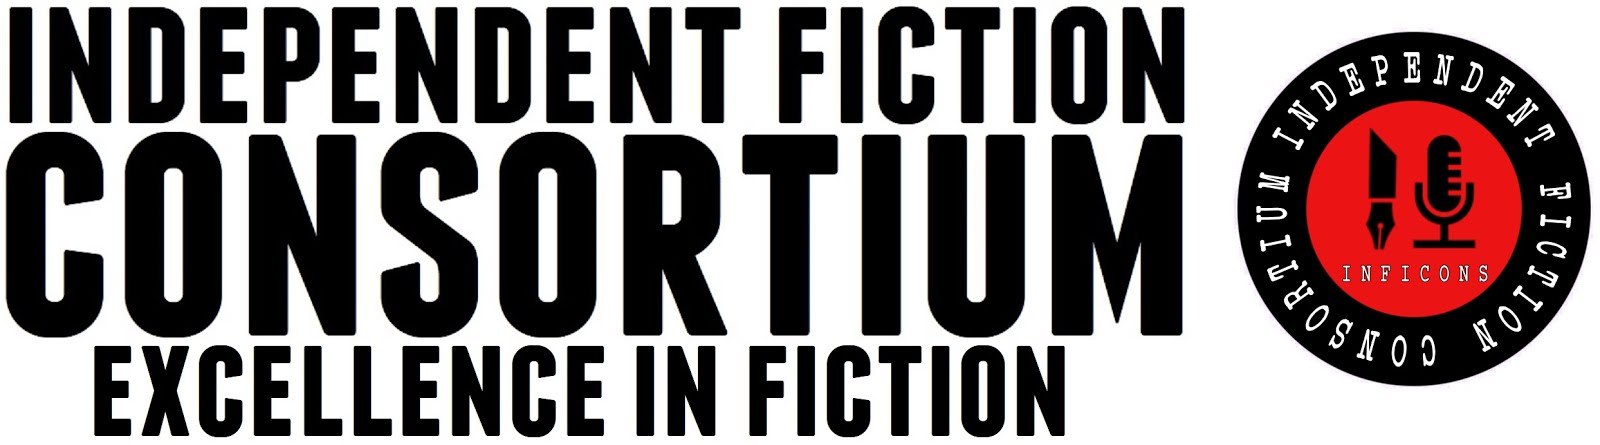 Independent Fiction Consortium